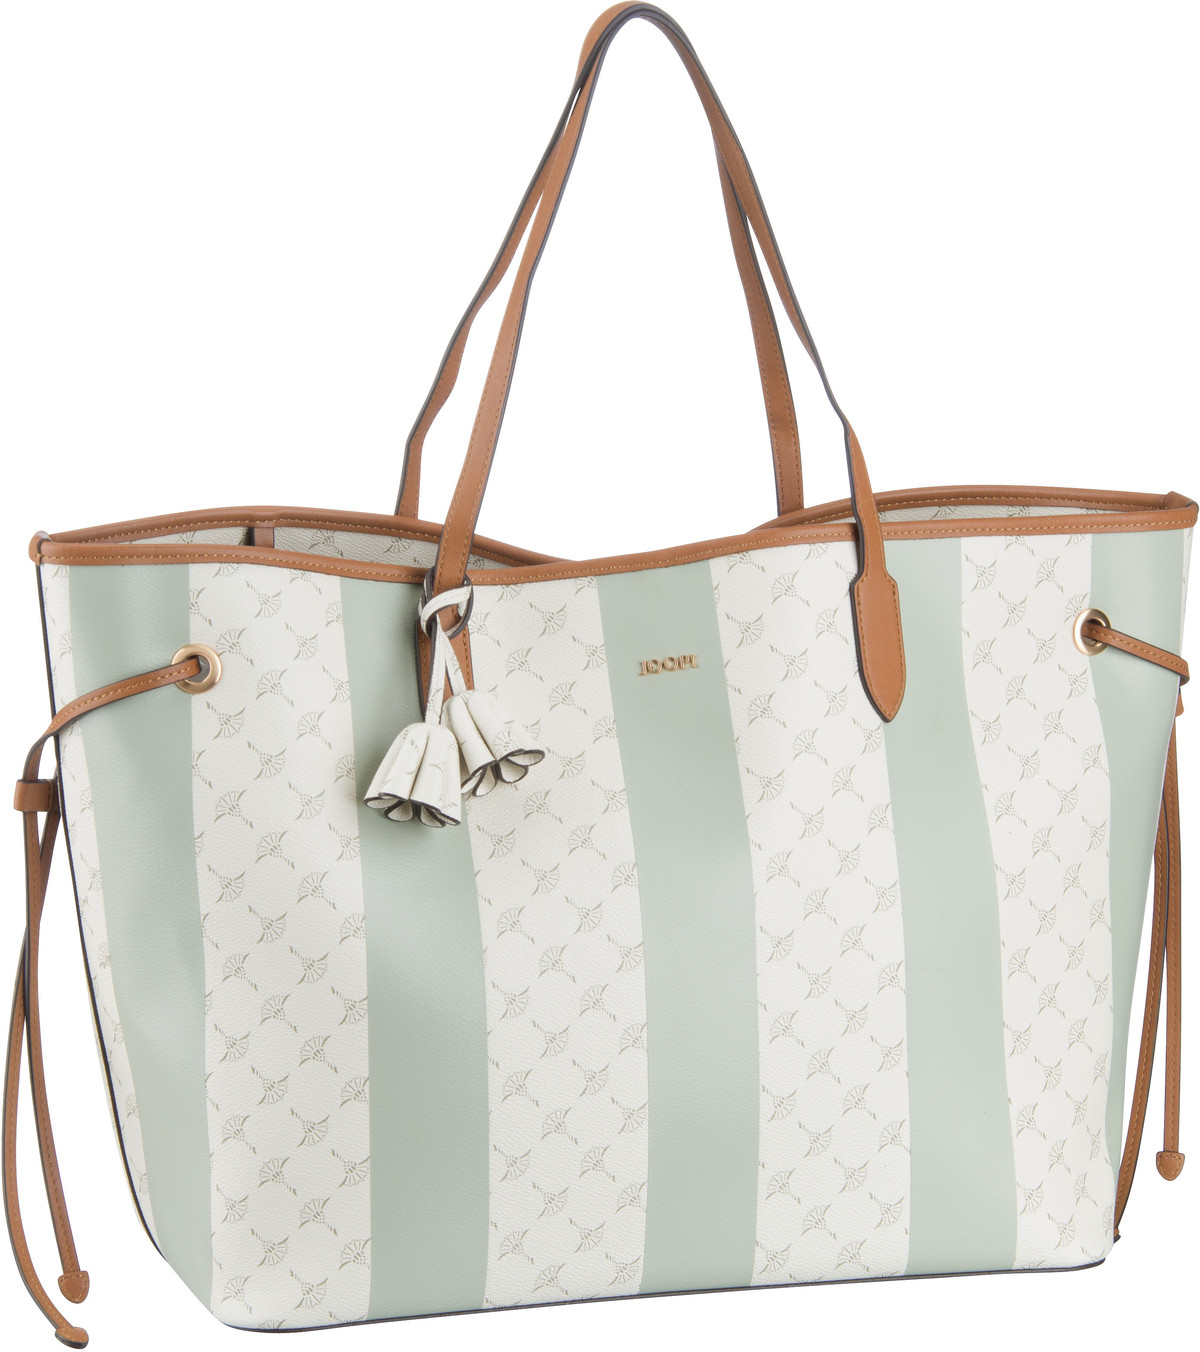 Handtasche Cortina Uno Lara Shopper XLHO Mint